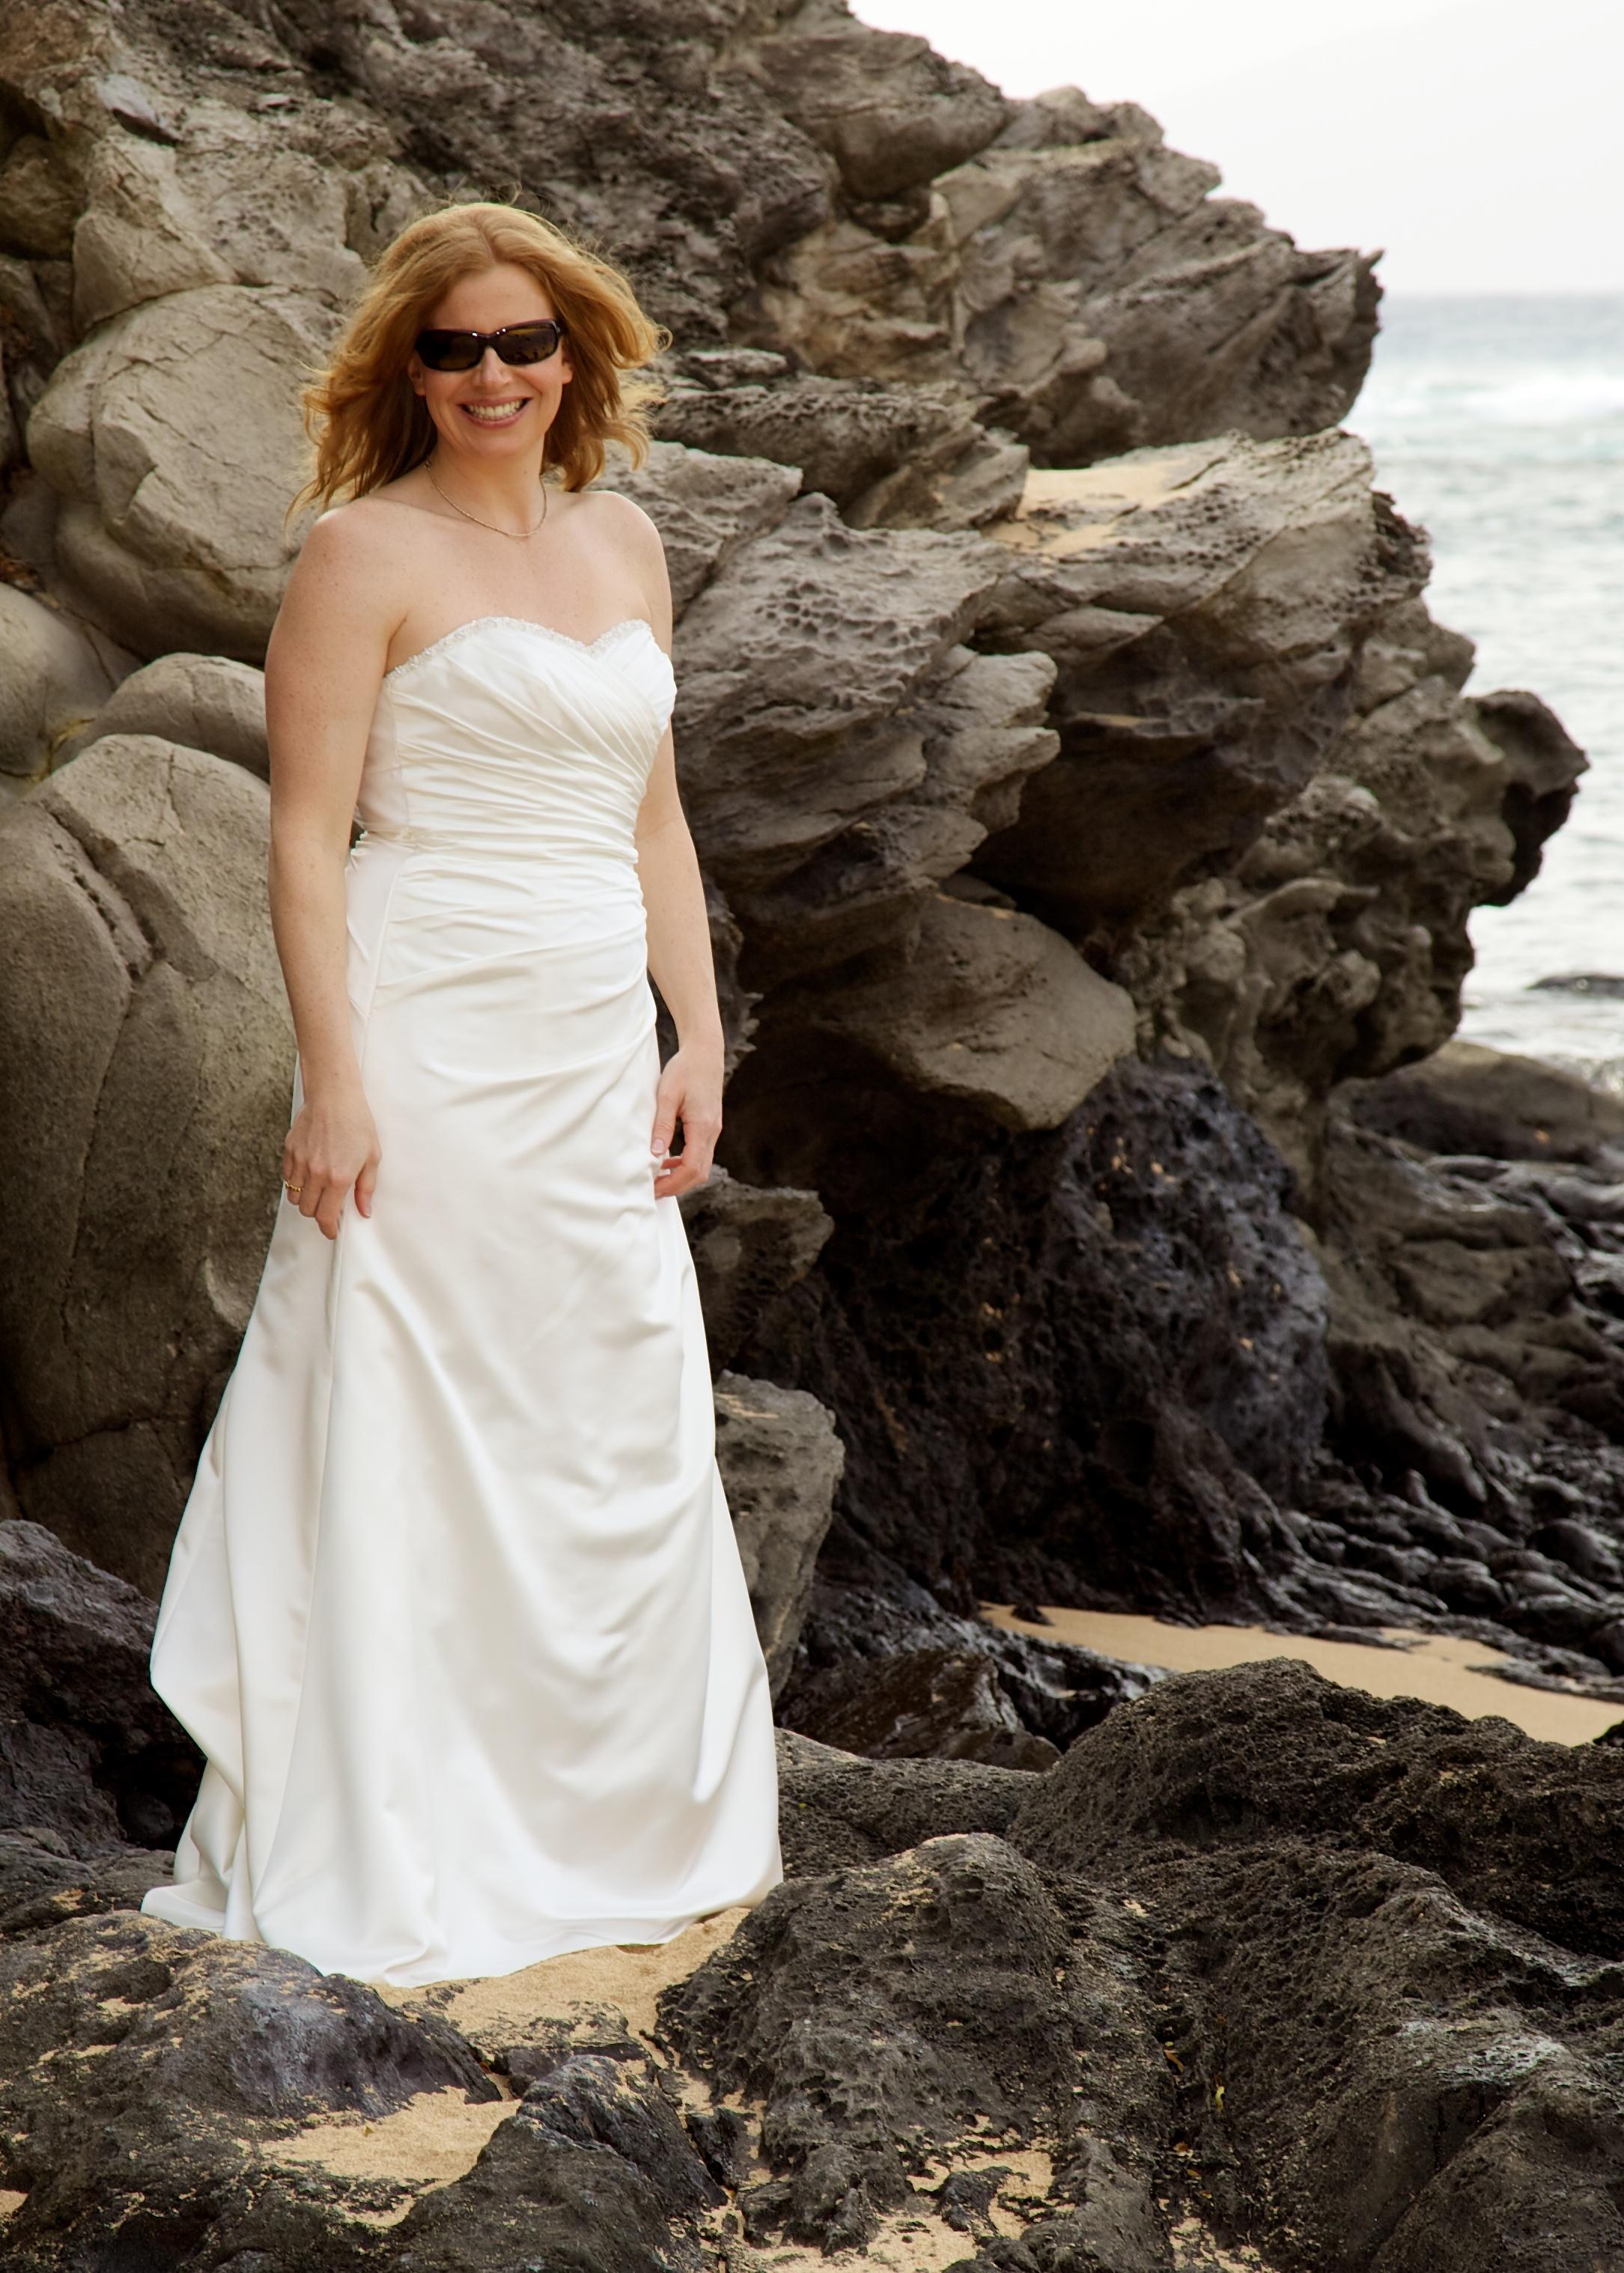 Wedding++28035+%2821+of+50%29-1766414612-O.jpg